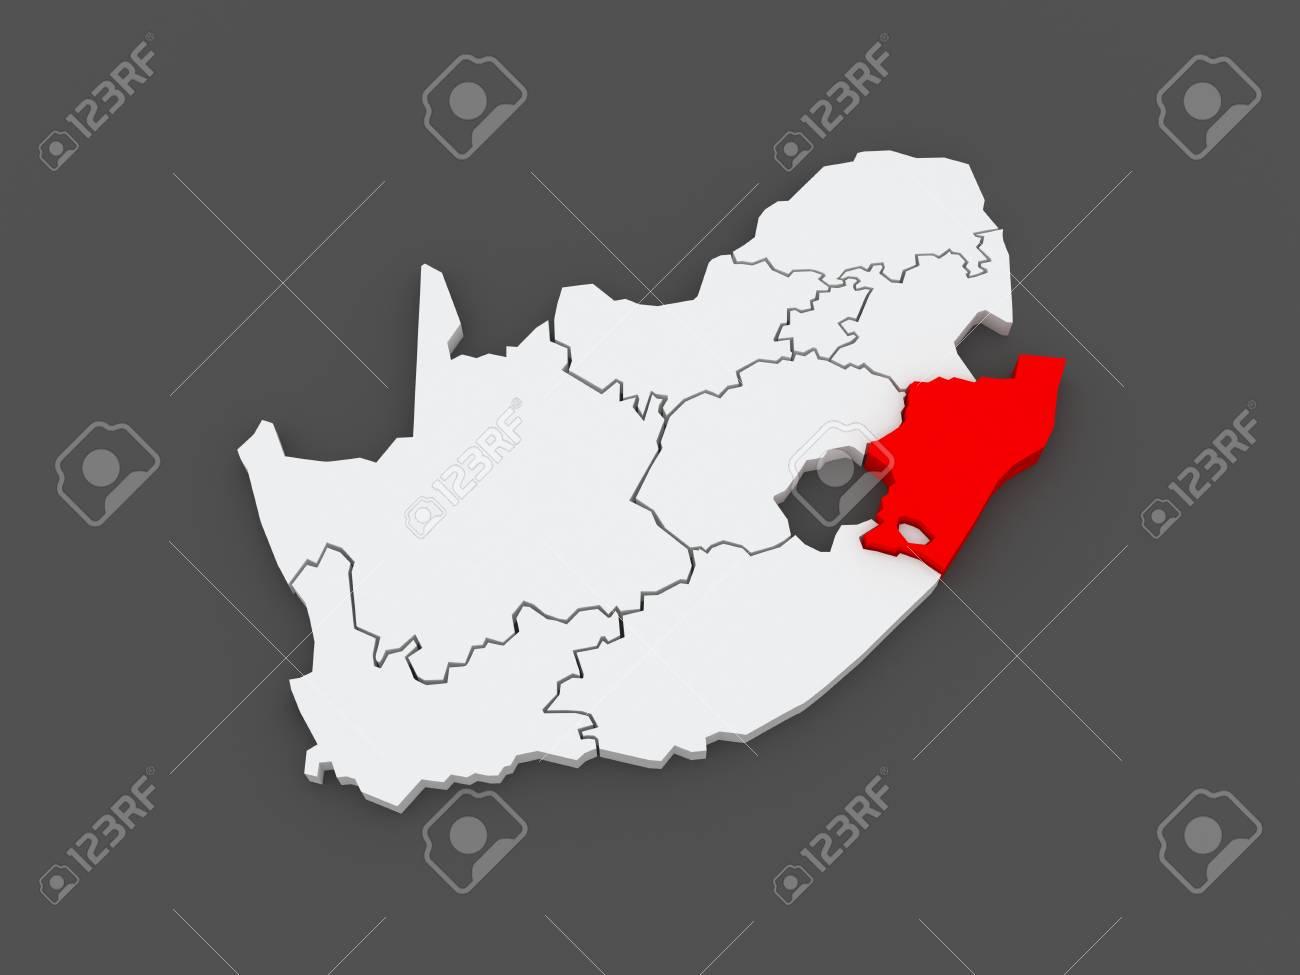 Natal South Africa Map.Map Of Kwazulu Natal Pietermaritzburg South Africa 3d Stock